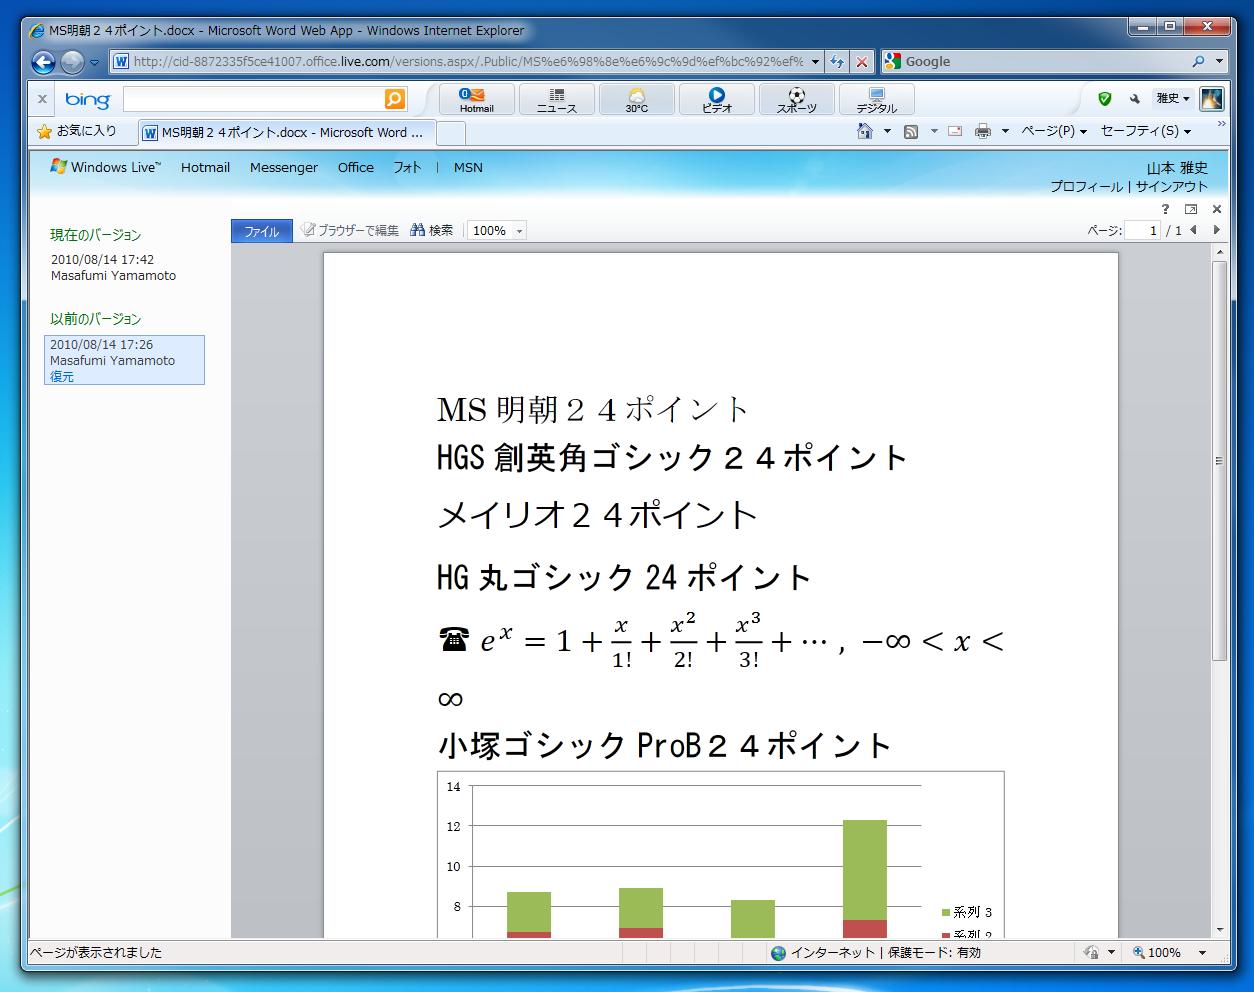 Offce Web Appでは、変更履歴を確認することが可能。古い文書に戻すこともできる